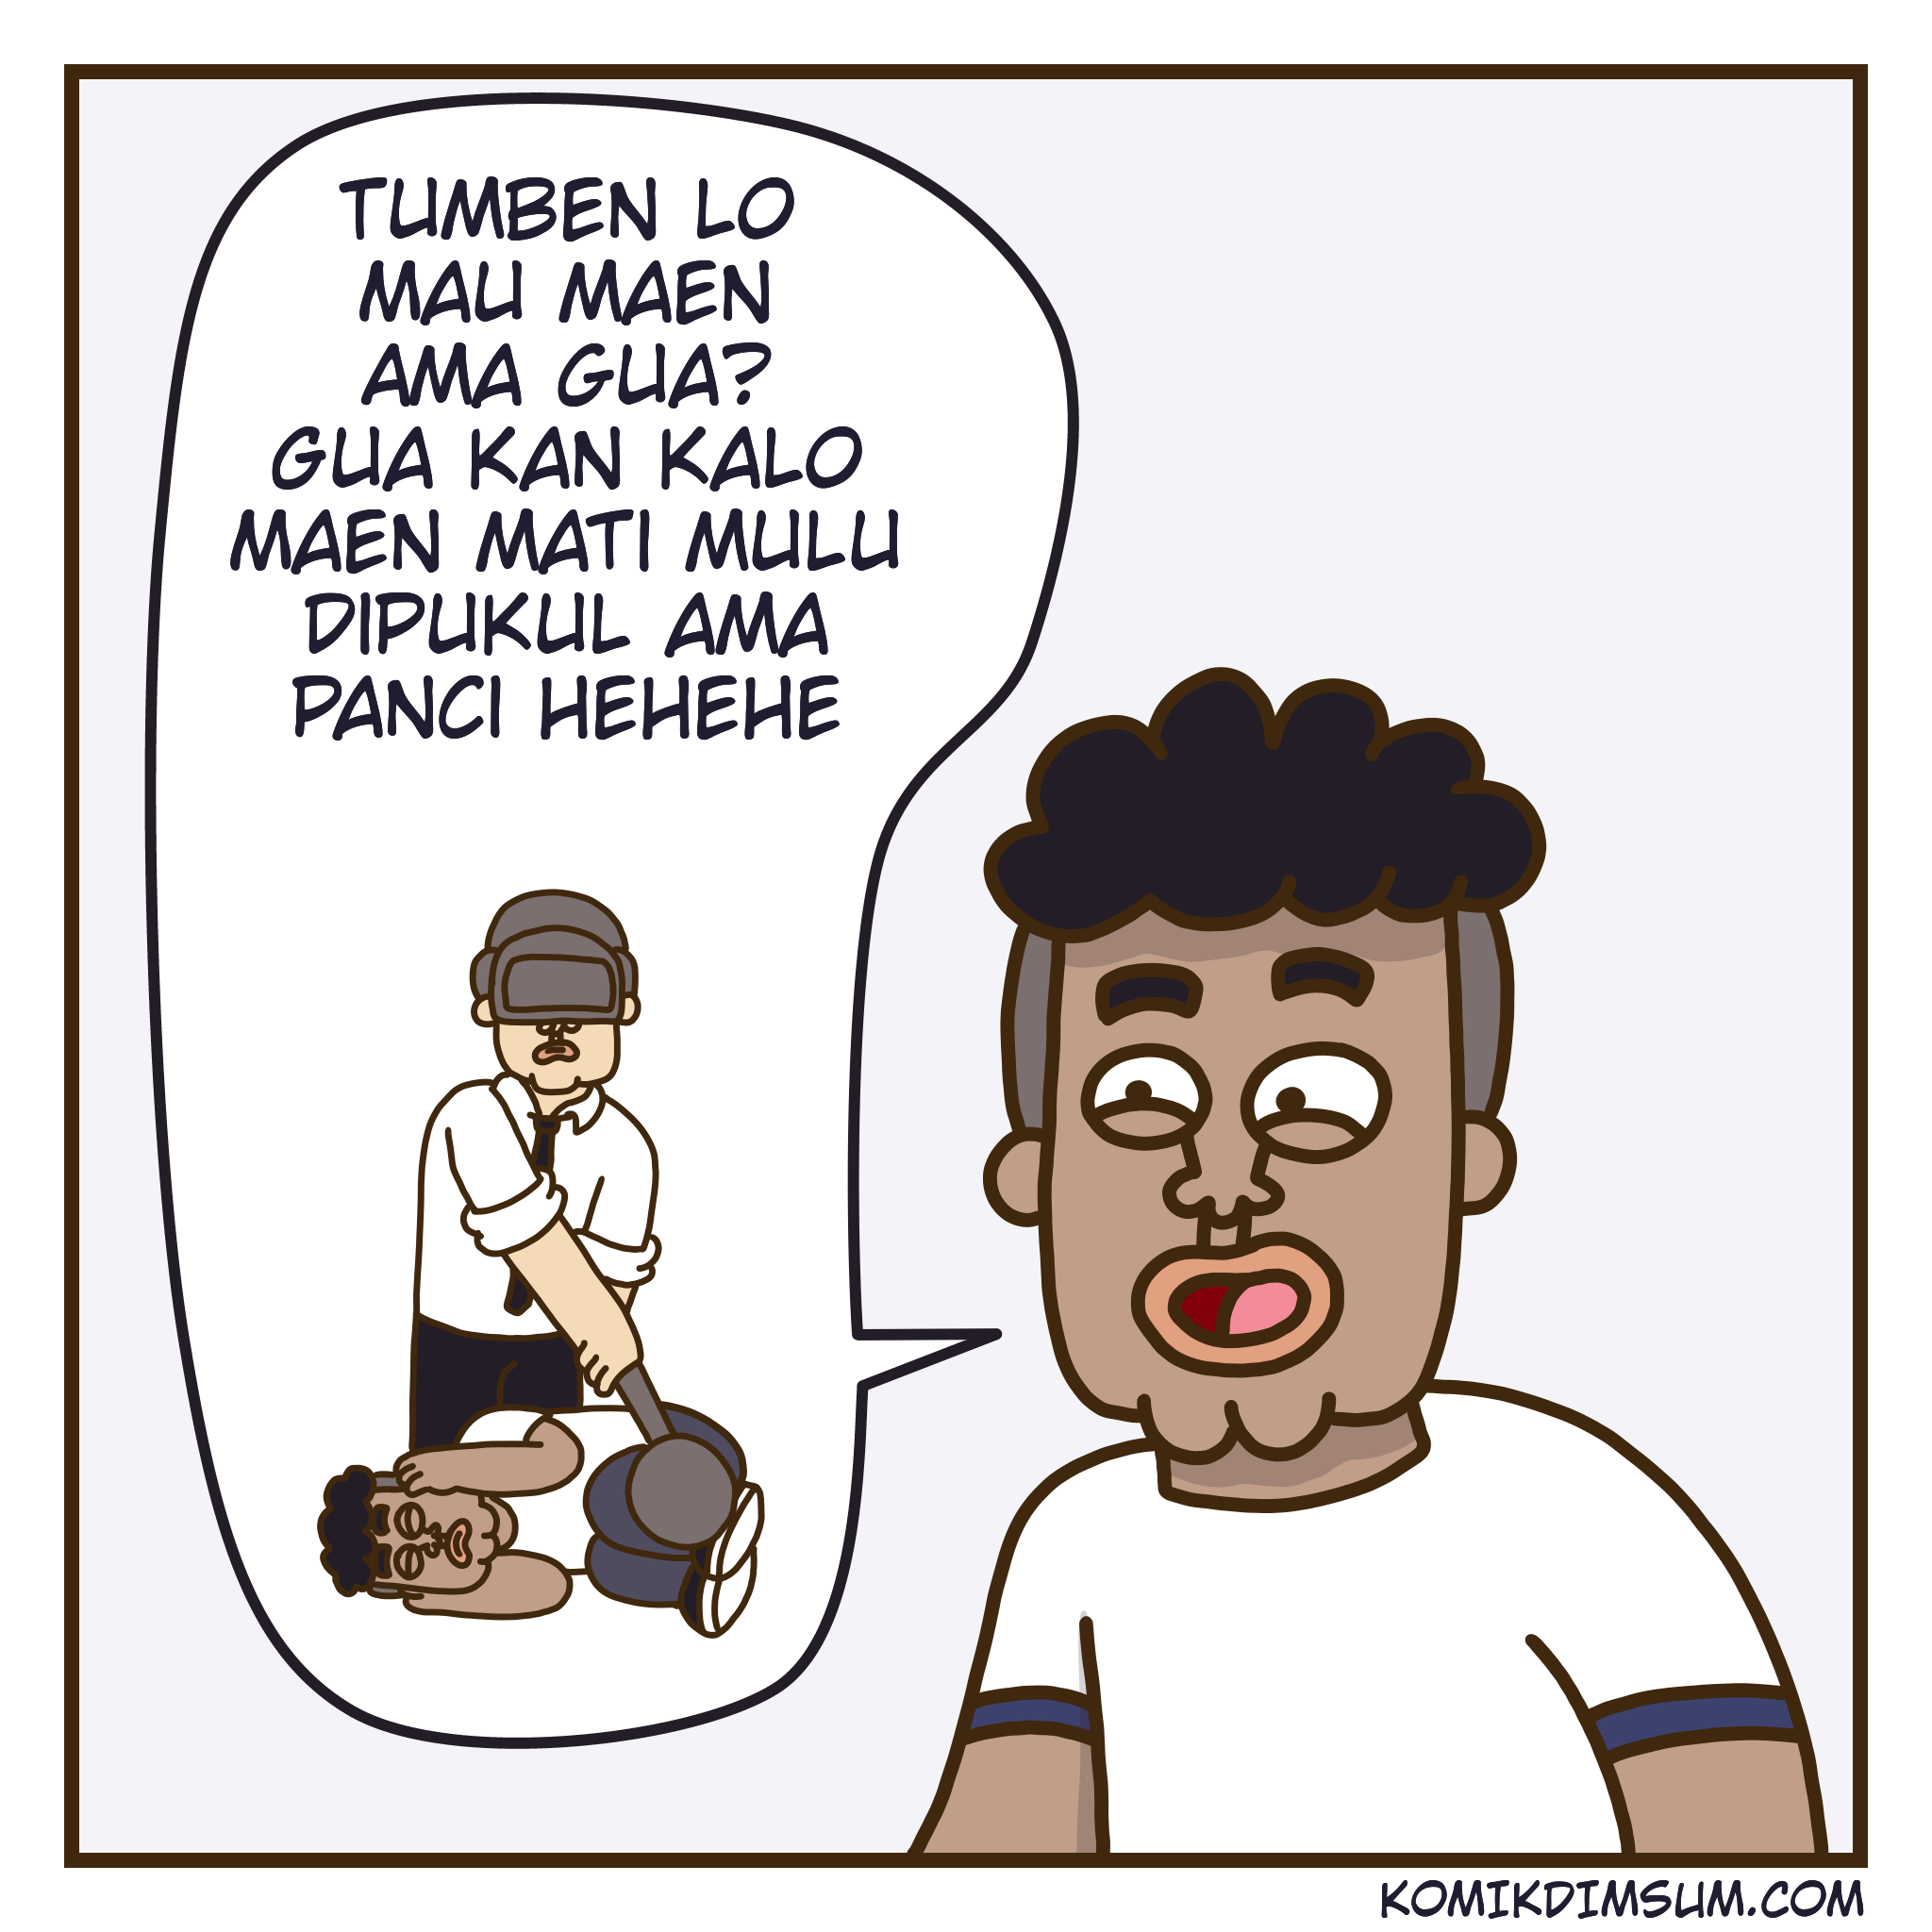 Ngabuburit Maen PUBG Mobile